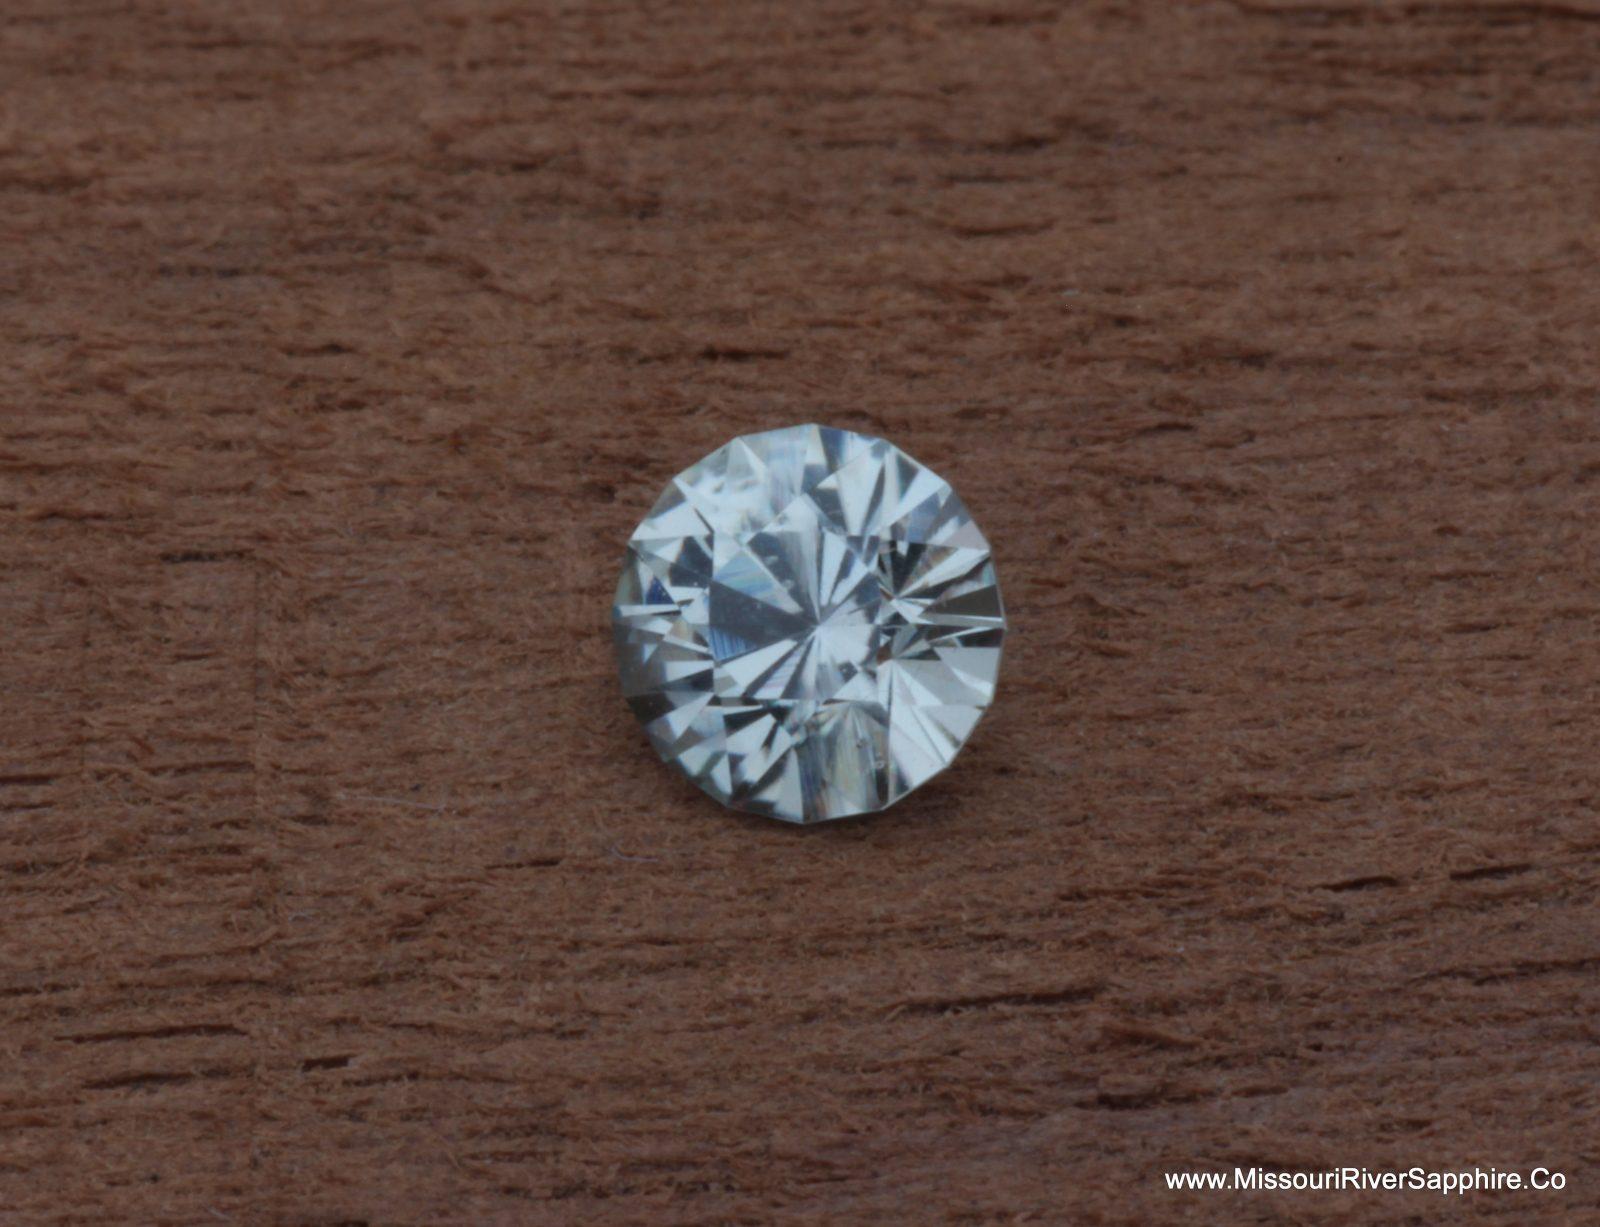 Montana Sapphire, Unheated, White, Clear, Round